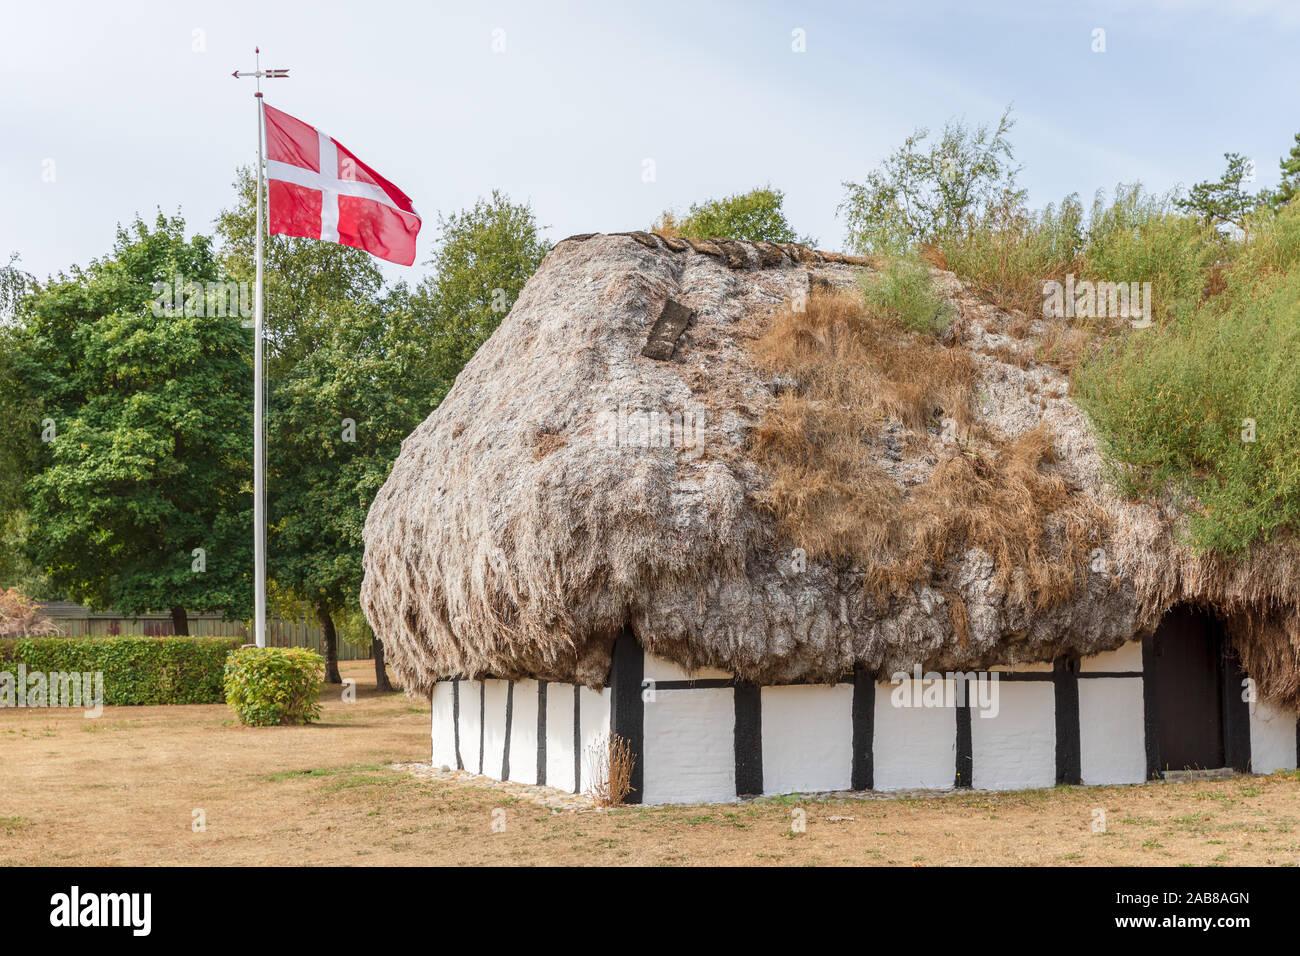 Seaweed roofed, timber-framed house; Hedvigs Hus (Hedvig's House); Læsø, Denmark Stock Photo